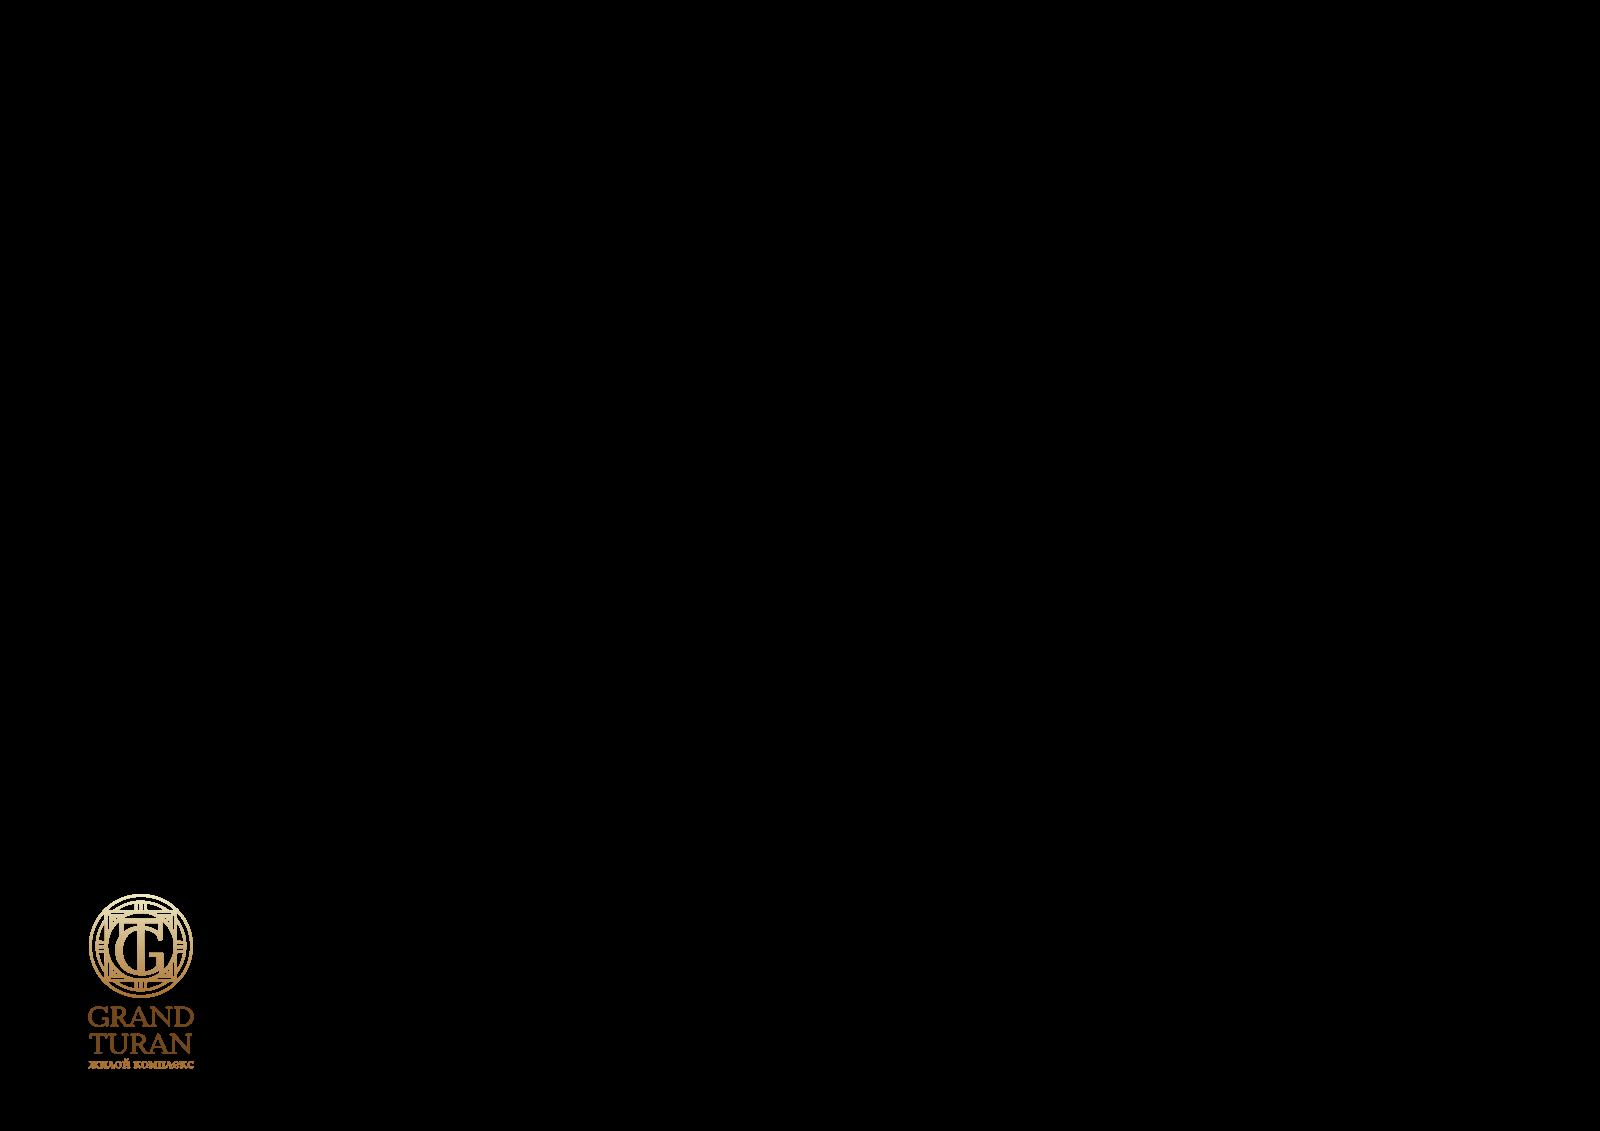 ЖК Grand Turan 3 комн         -  26 051 393 тг.